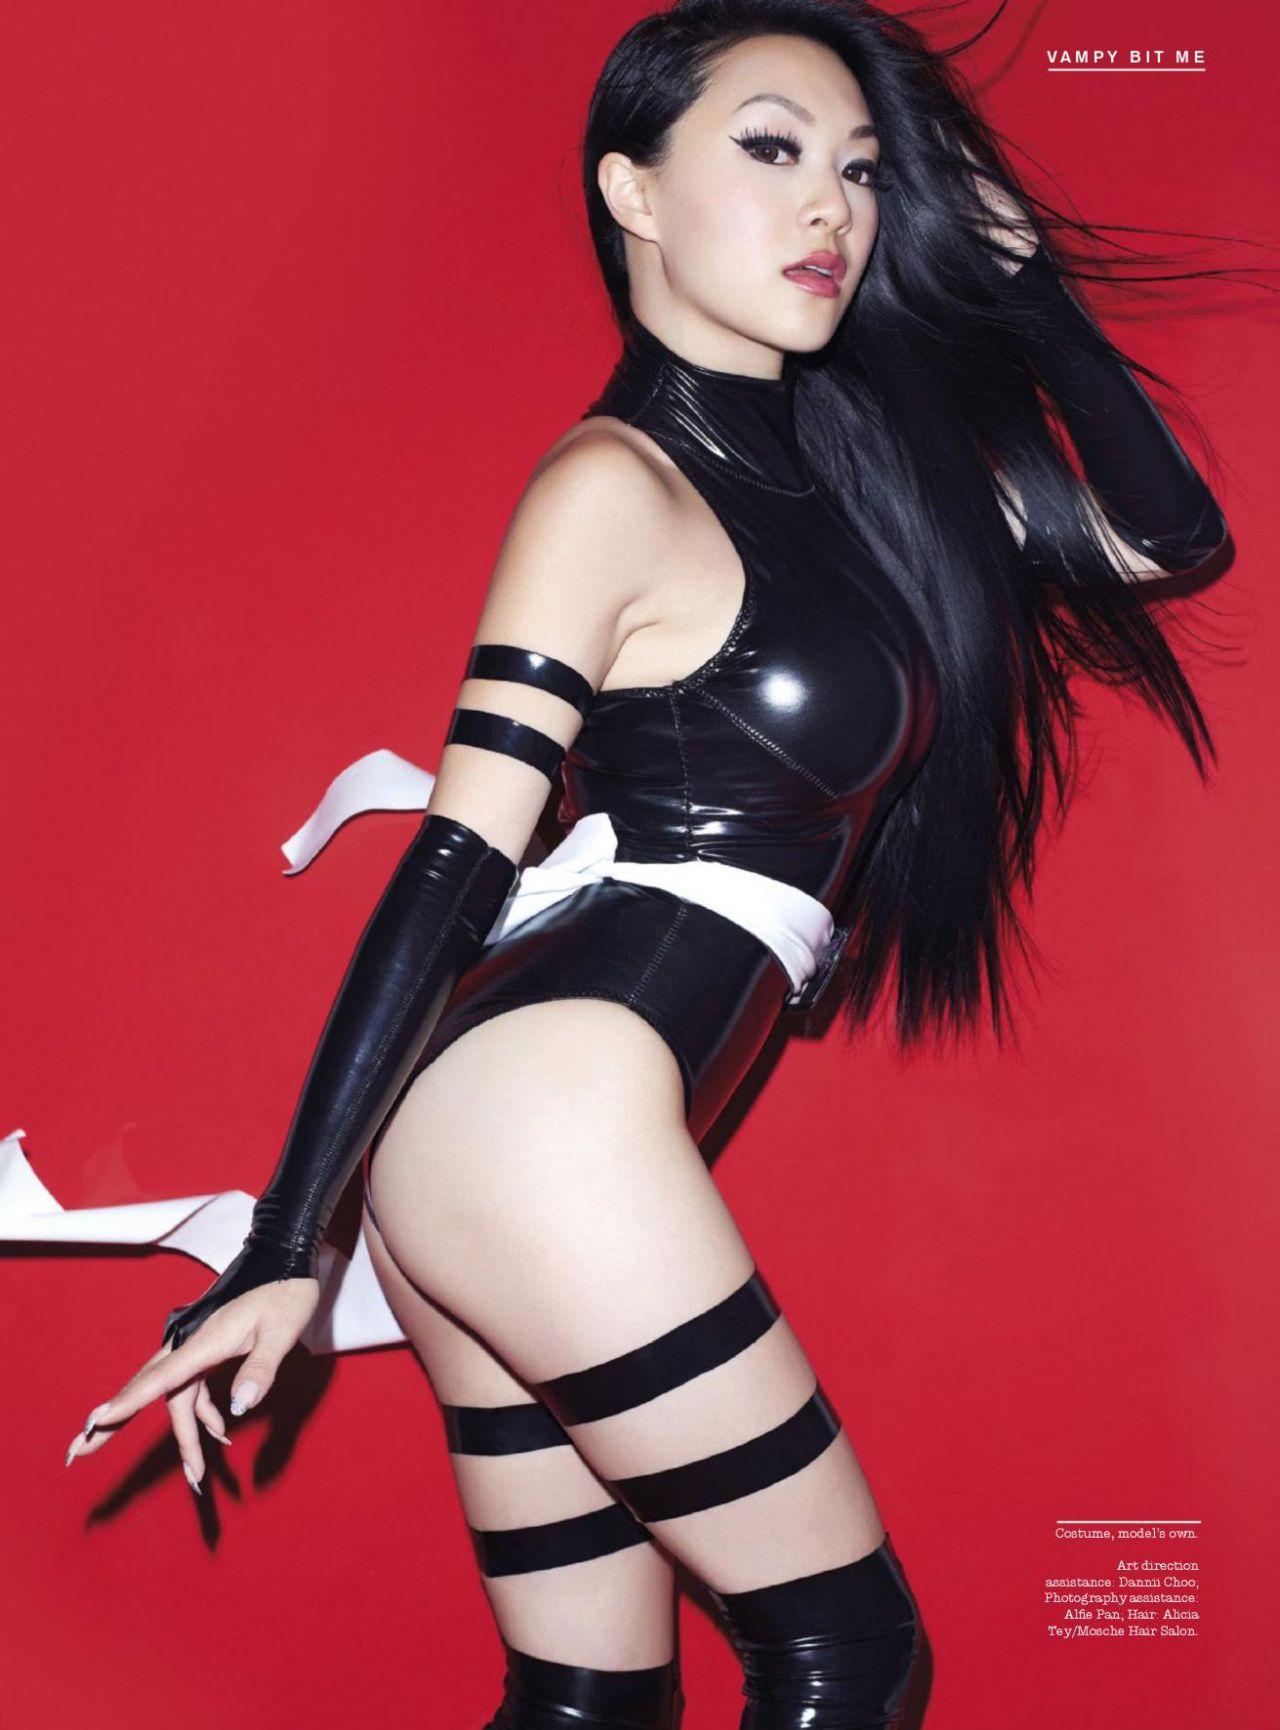 Vampier sex nude full movie free download sex vids